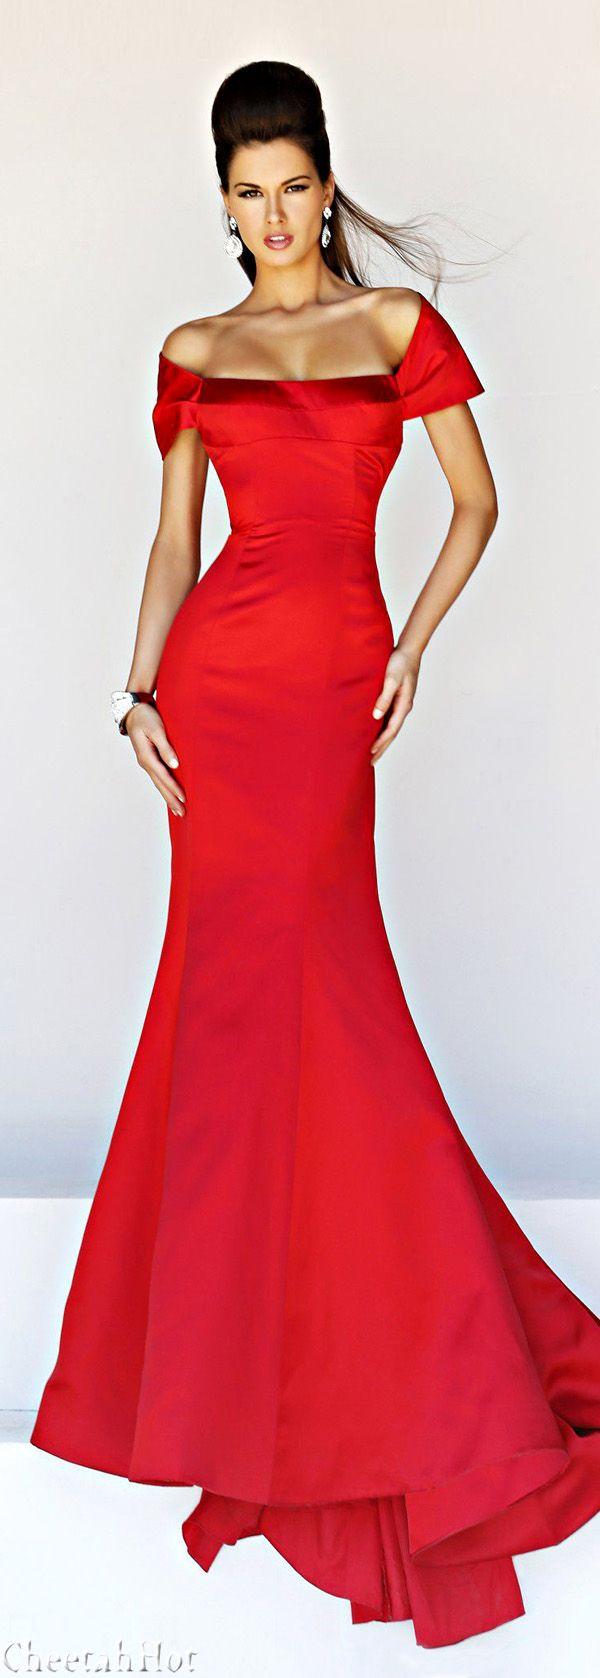 CheetahHot Style and Fashion Dresses.   Bond girl dress